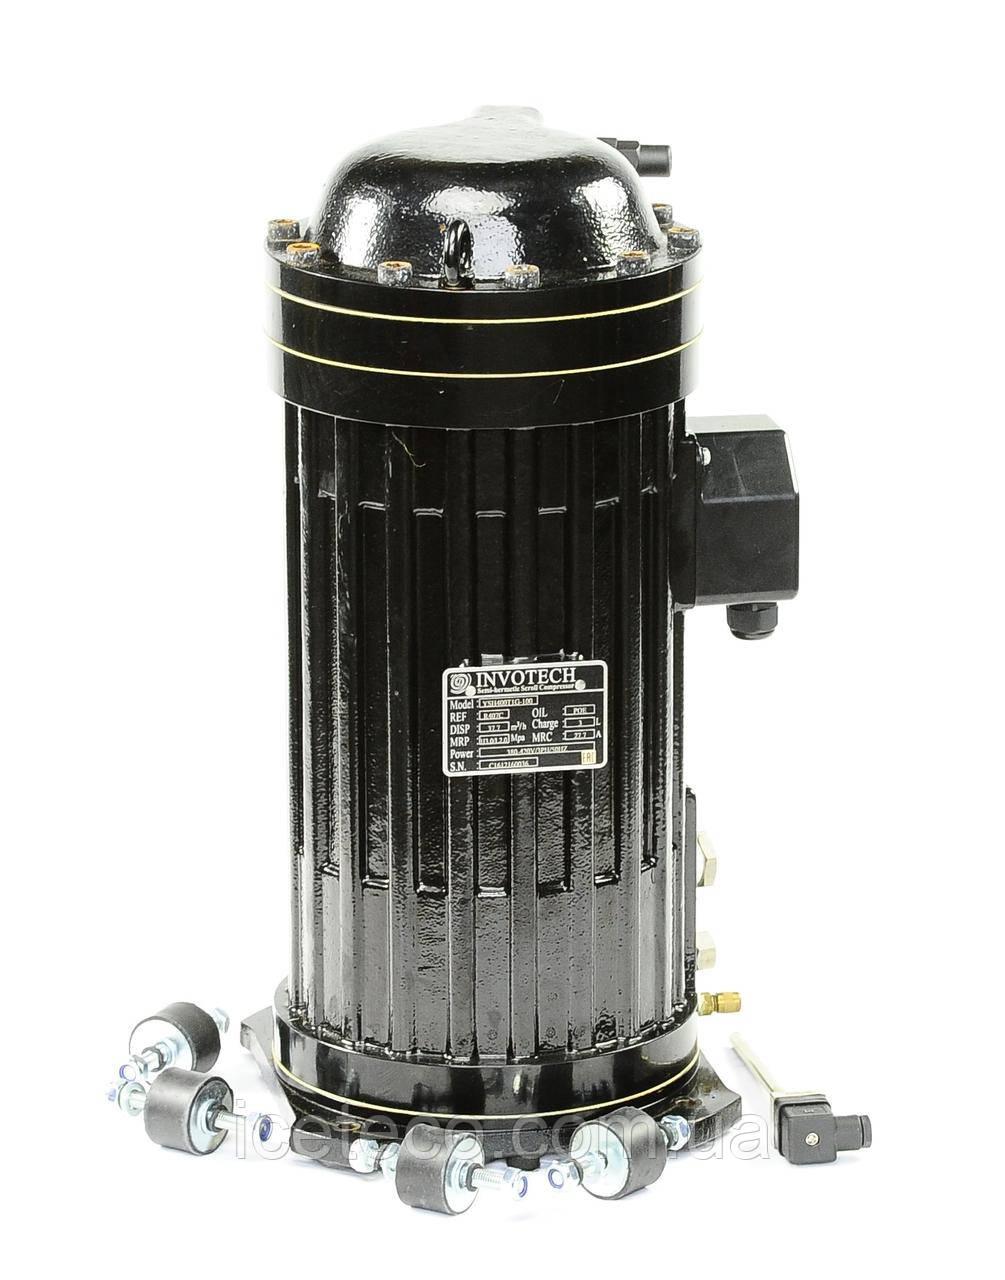 Компрессор спиральный YSH400T1G-100 Invotech